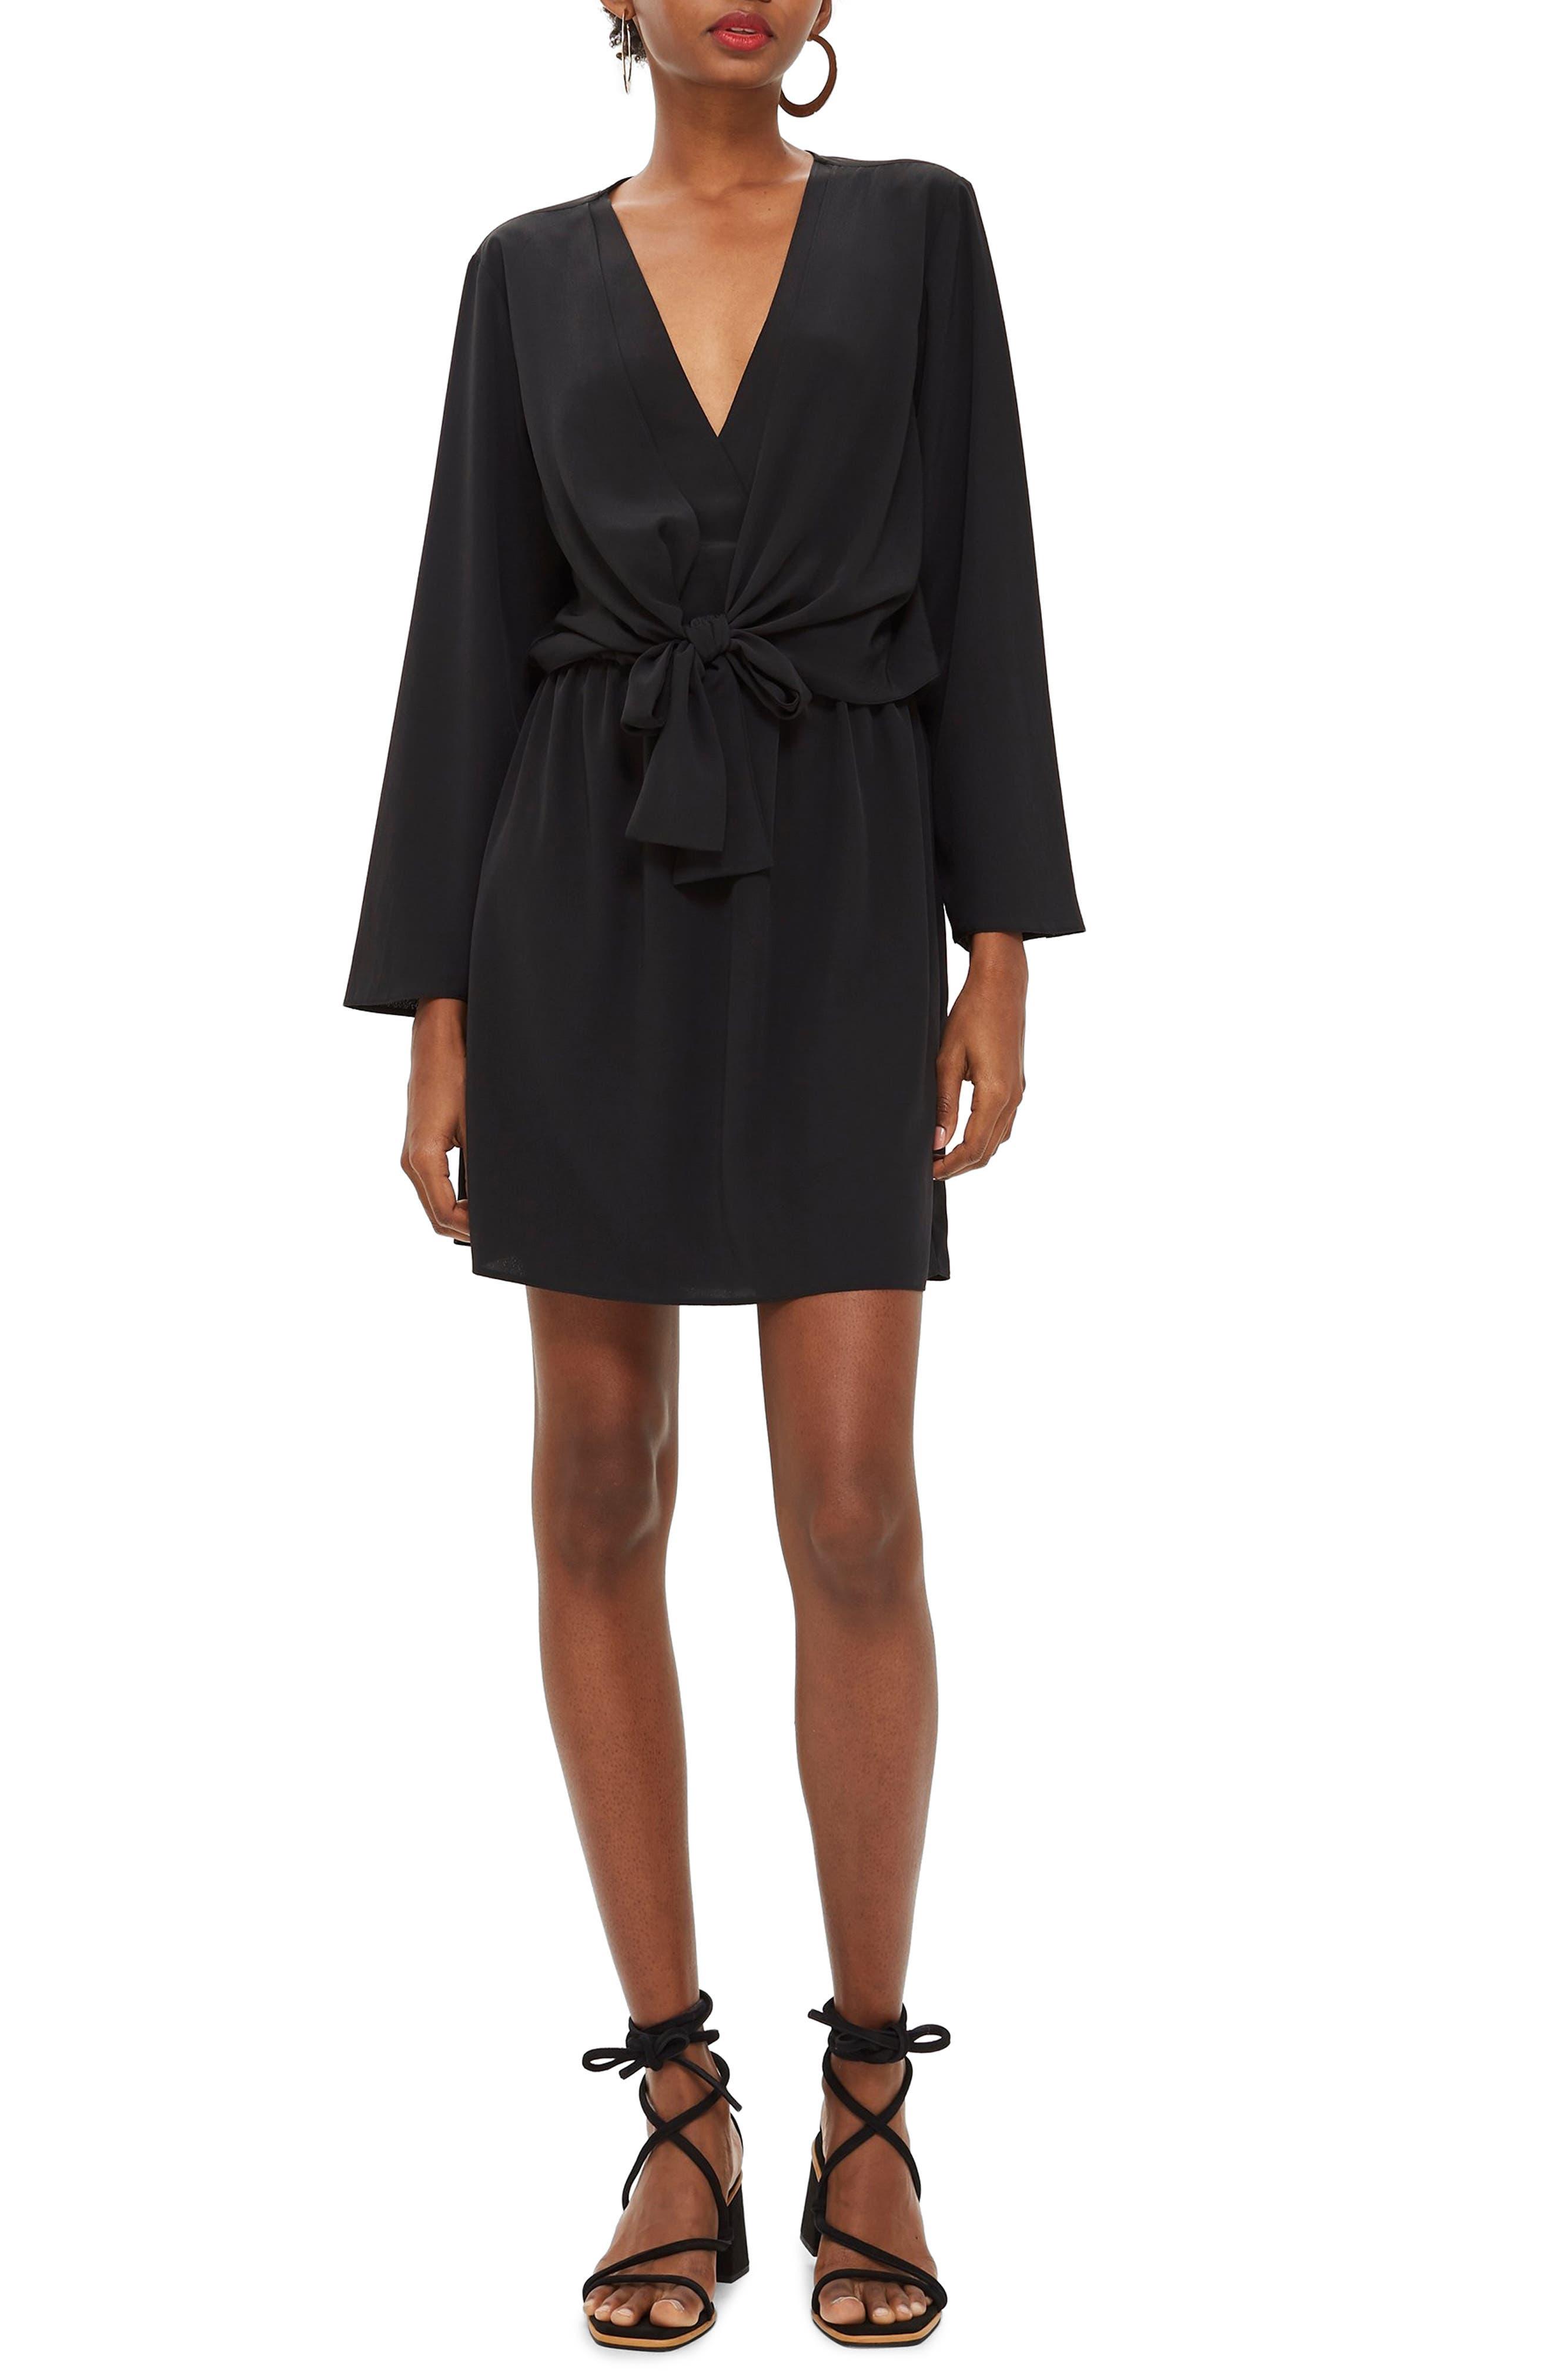 Women's 70s Shirts, Blouses, Hippie Tops Womens Topshop Tiffany Knot Minidress Size 0 US fits like 00 - Black $68.00 AT vintagedancer.com